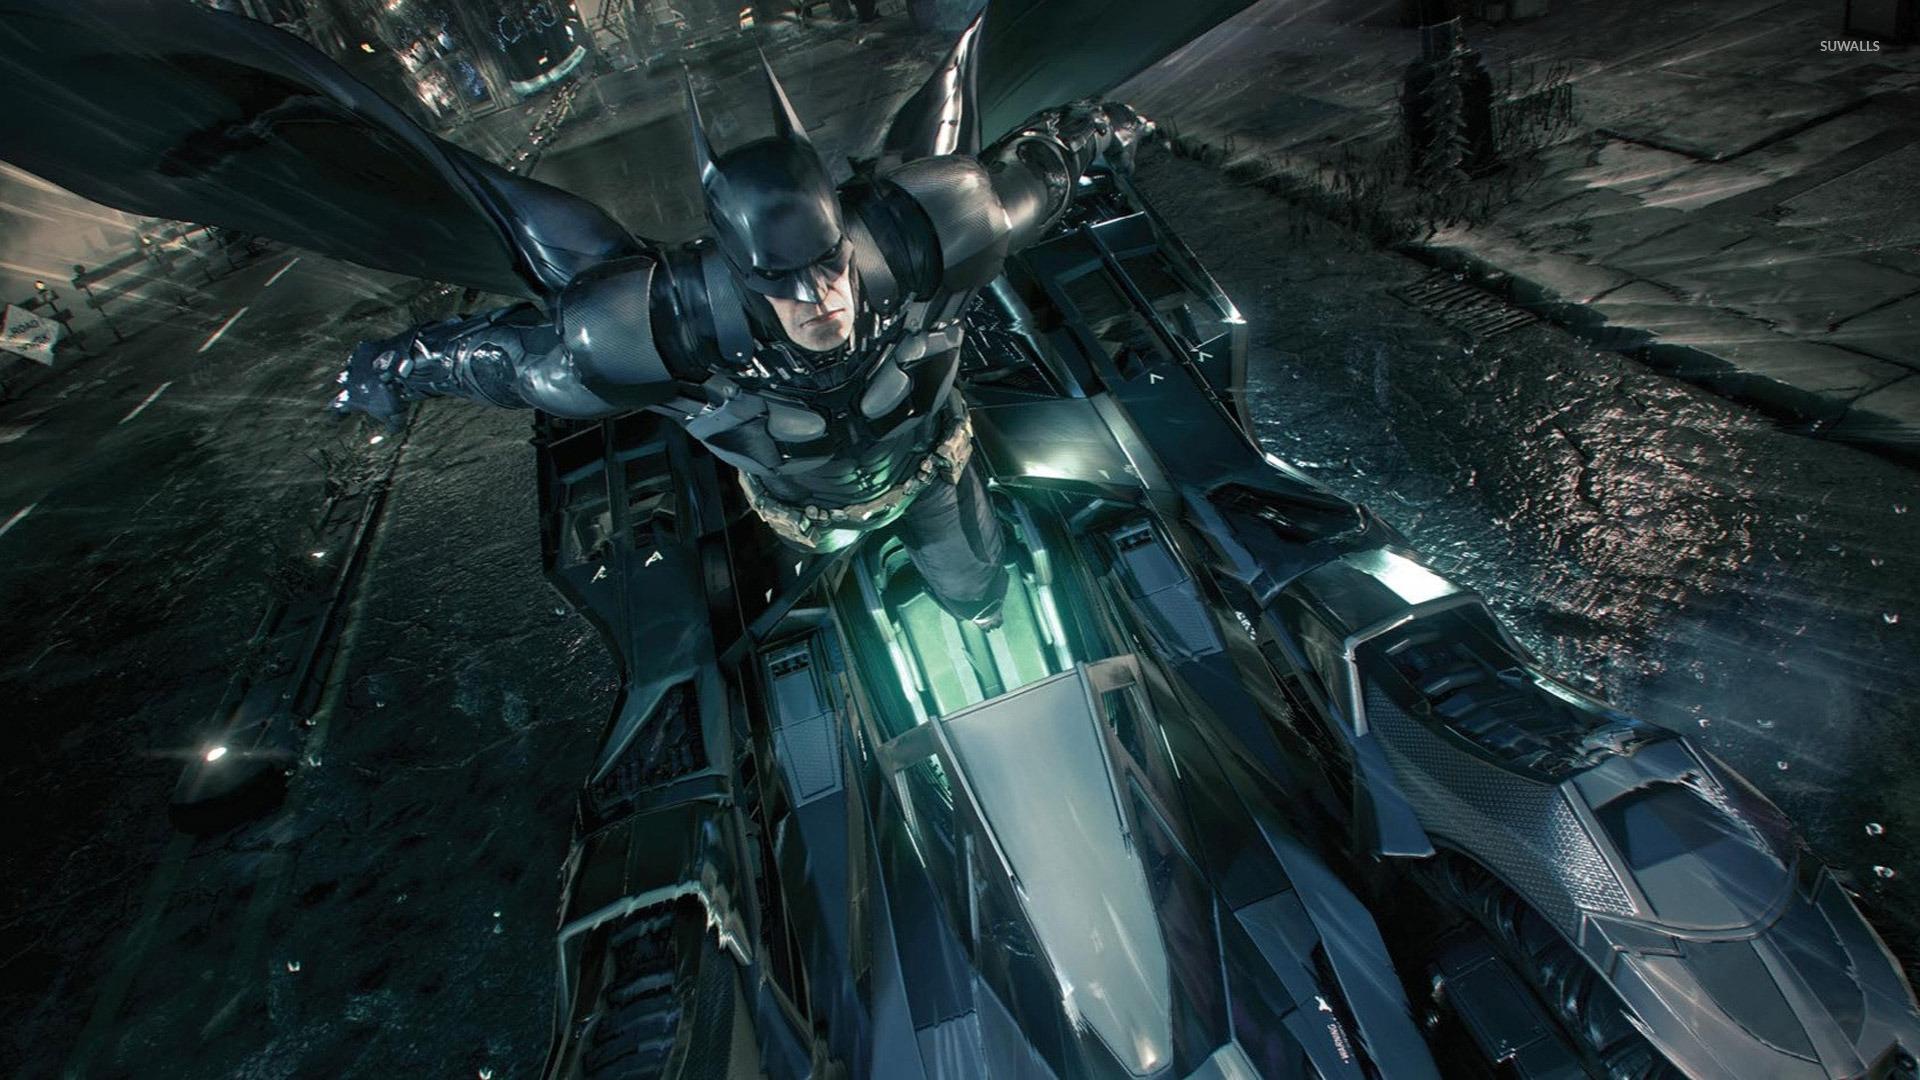 Batman Arkham Knight 17 Wallpaper Game Wallpapers 30965